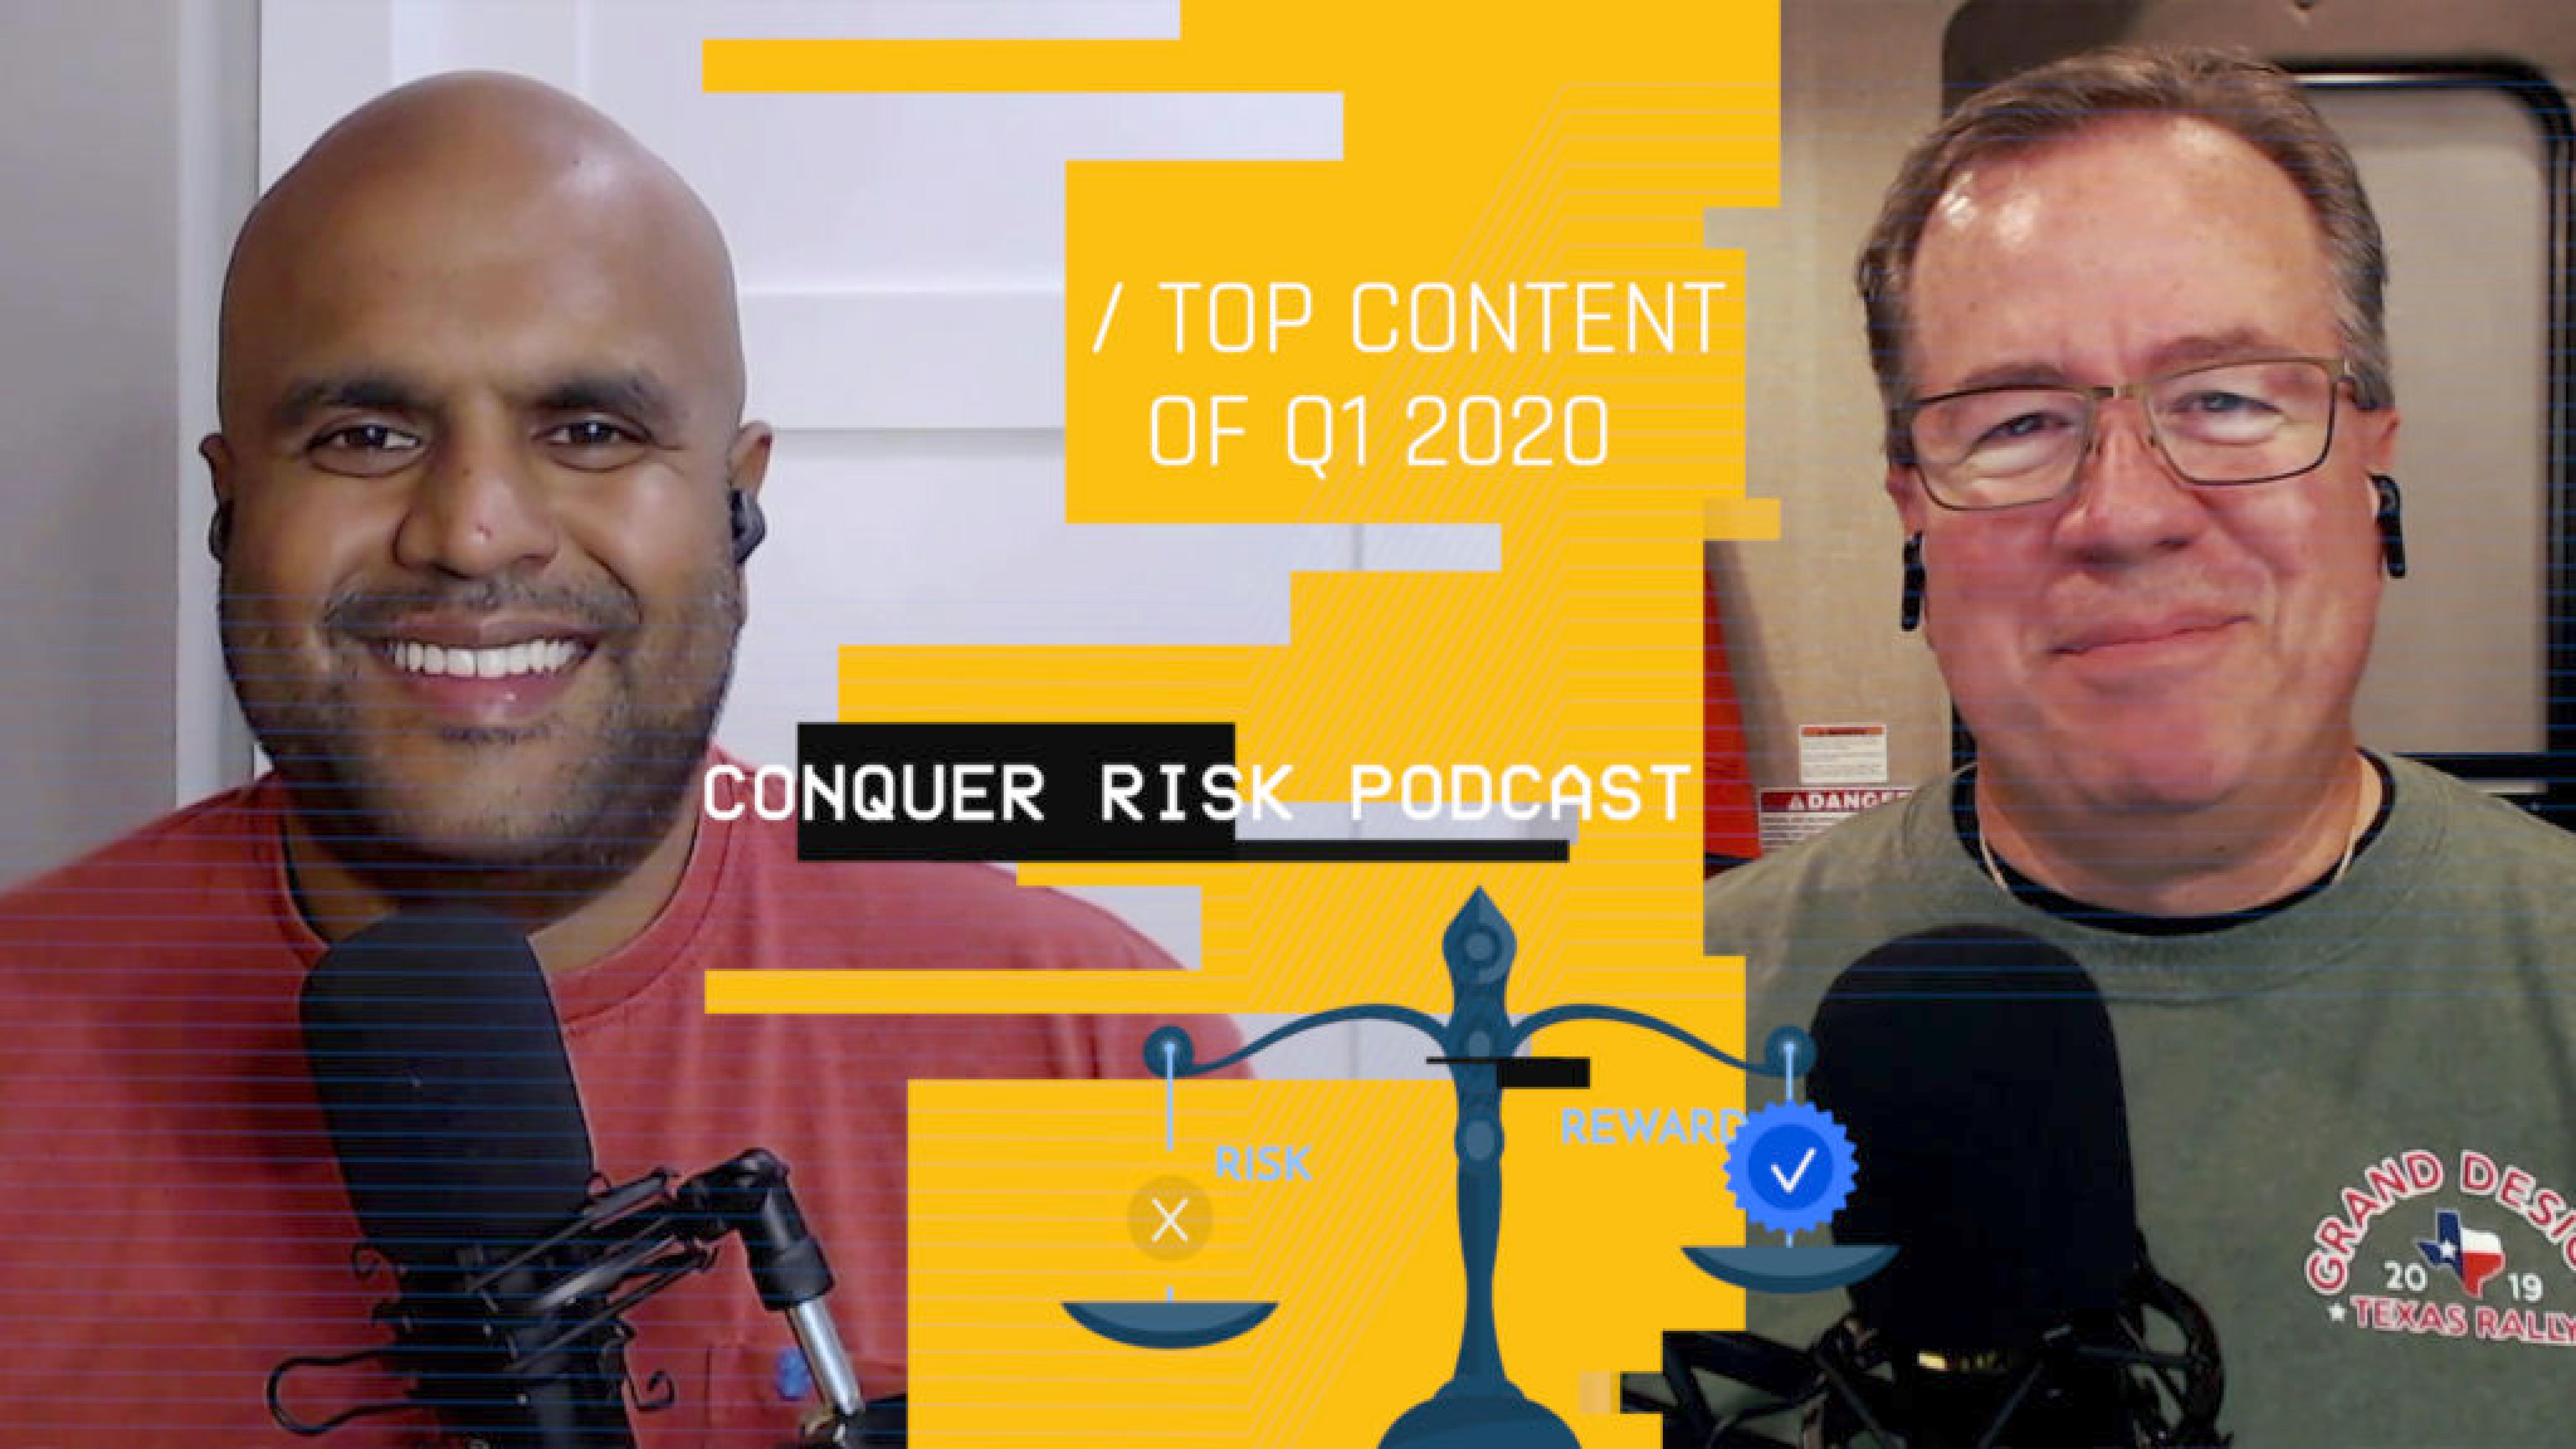 Top Content of Q1 2020 (S2 E16)